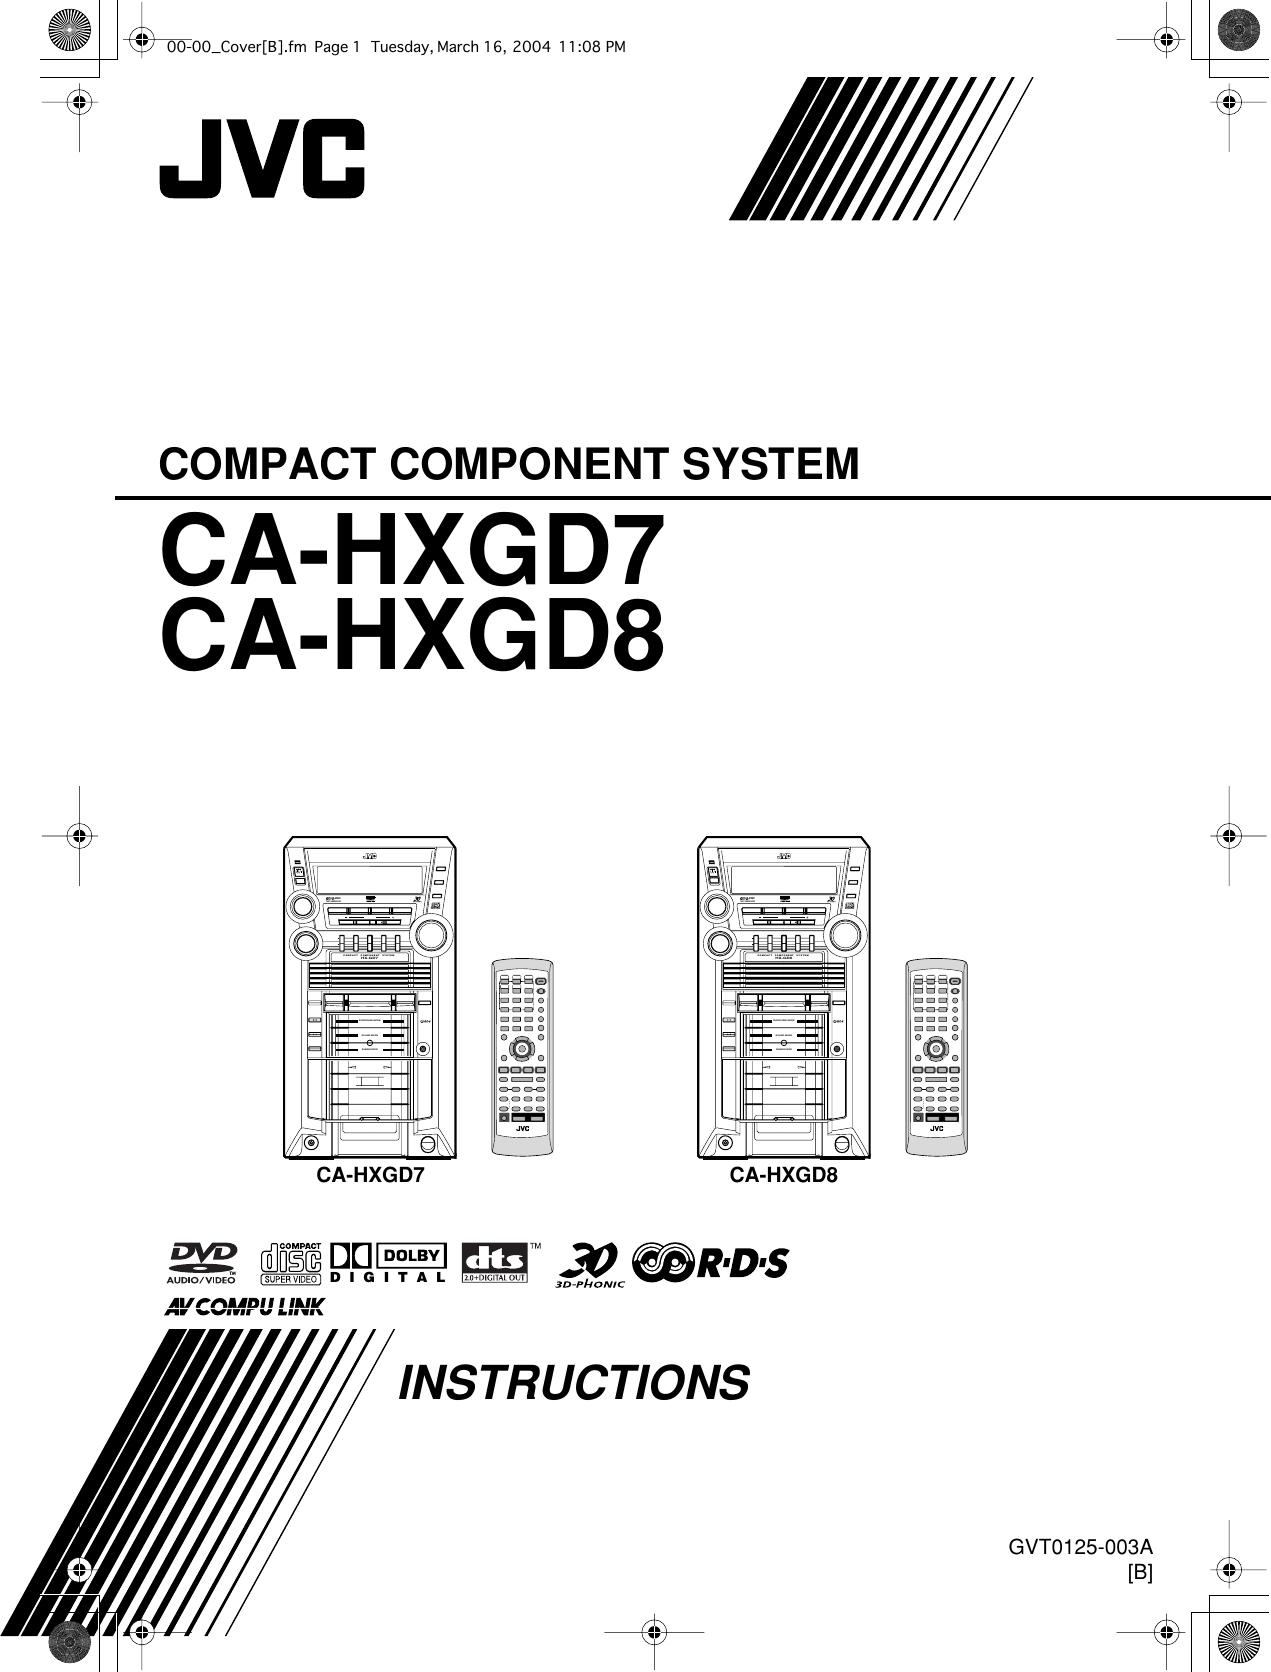 Jvc Gvt0125 003A Users Manual CA HXGD7/GD8